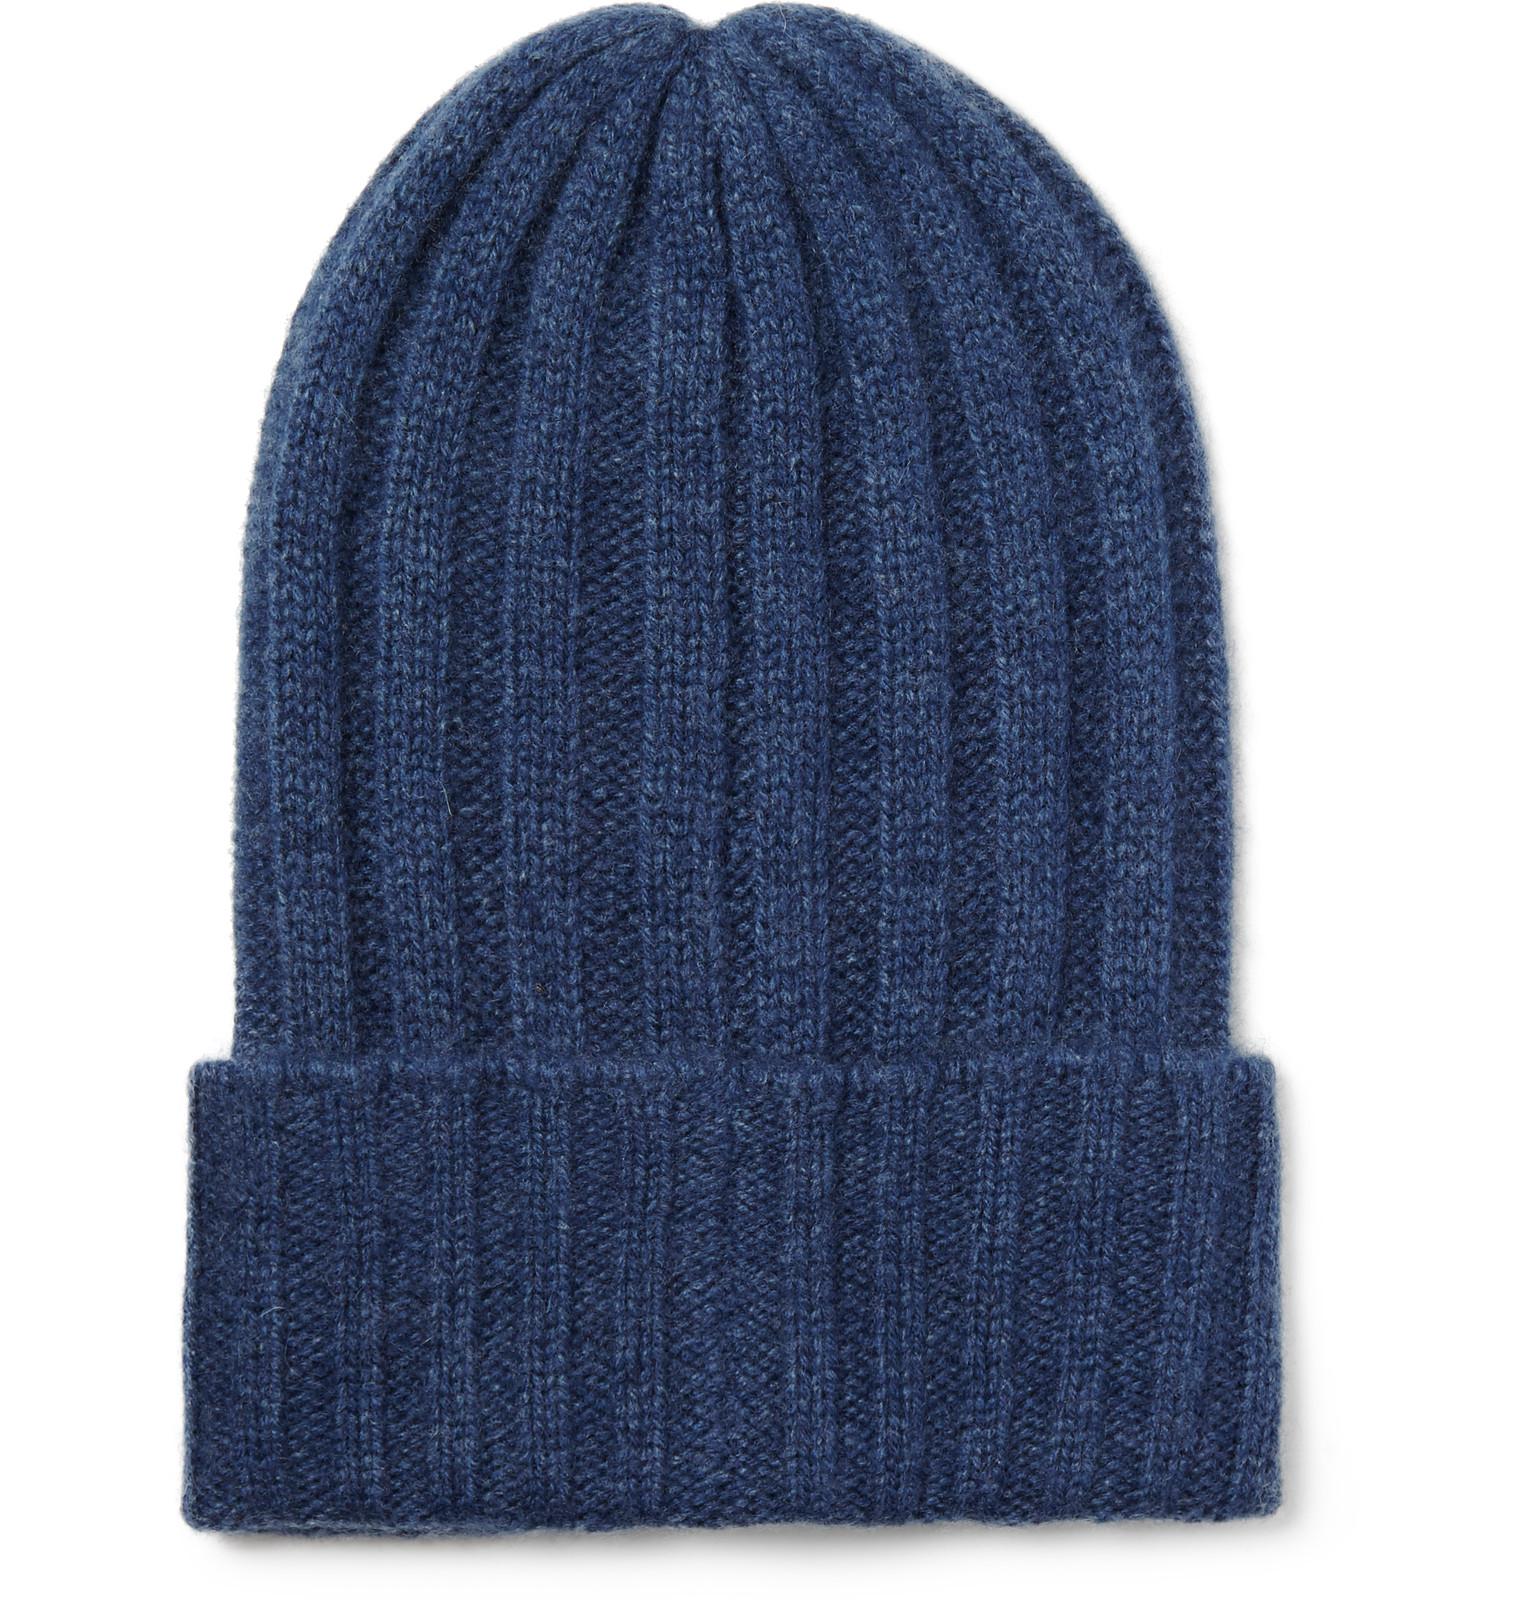 rib knit beanie - Blue The Elder Statesman pCRdFx